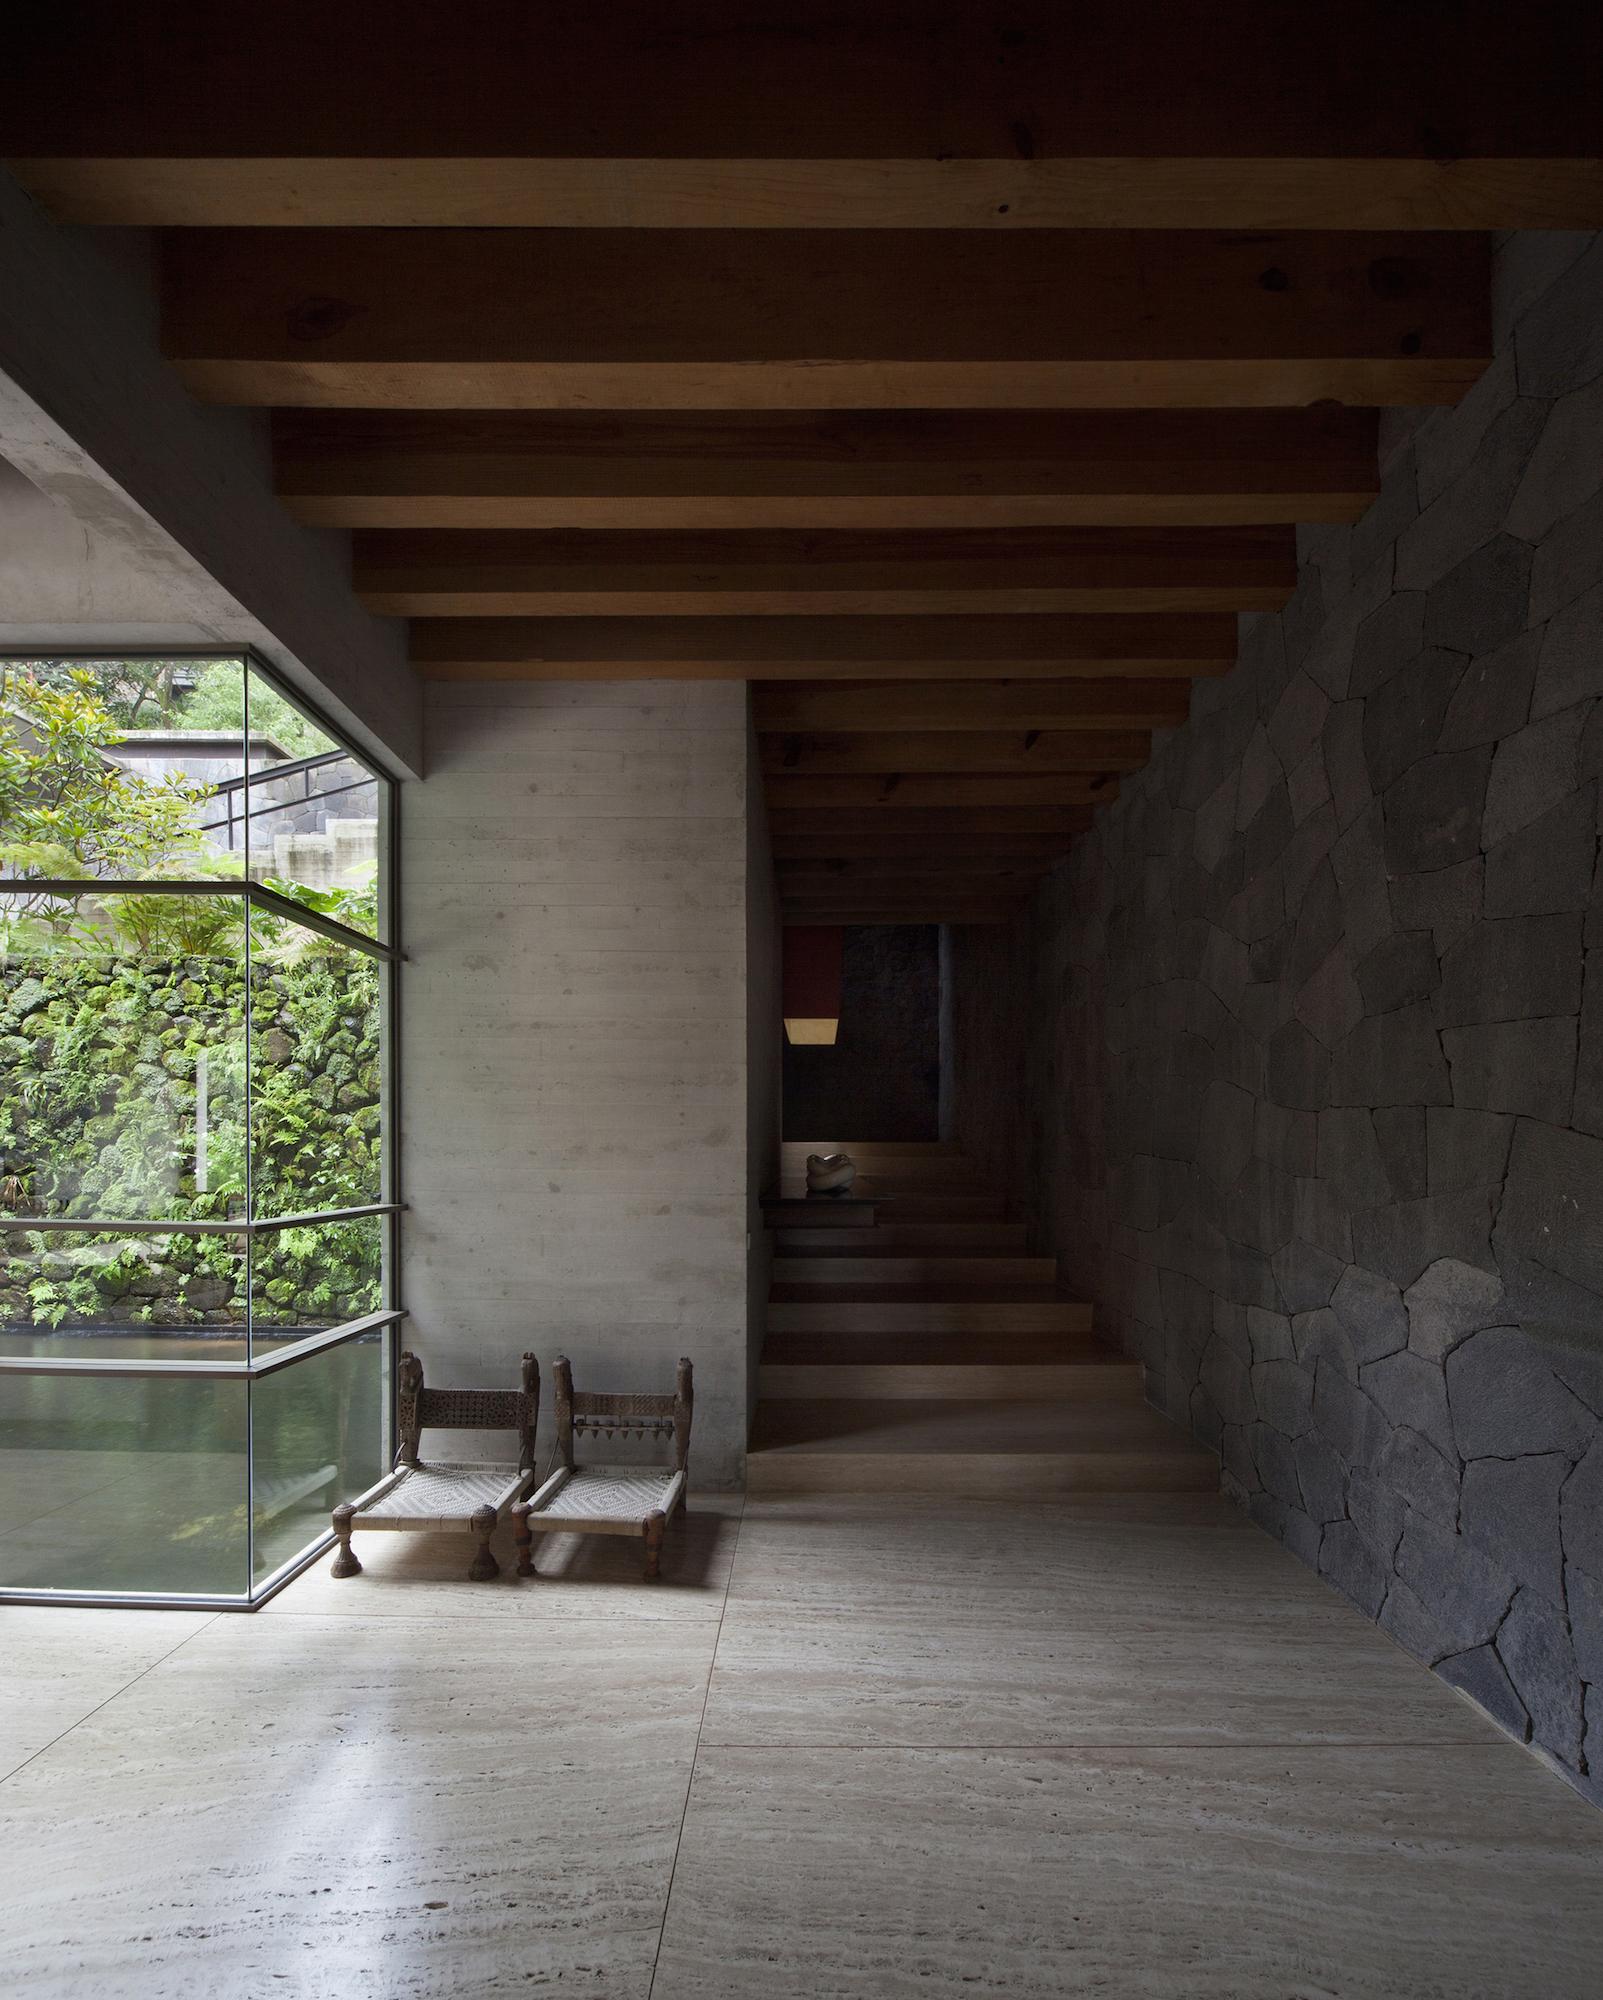 530eb57ac07a80ed3b000153_house-maza-chk-arquitectura_2014_02_18_mz_fotos_yoshihiro_2280px_ancho_-12-